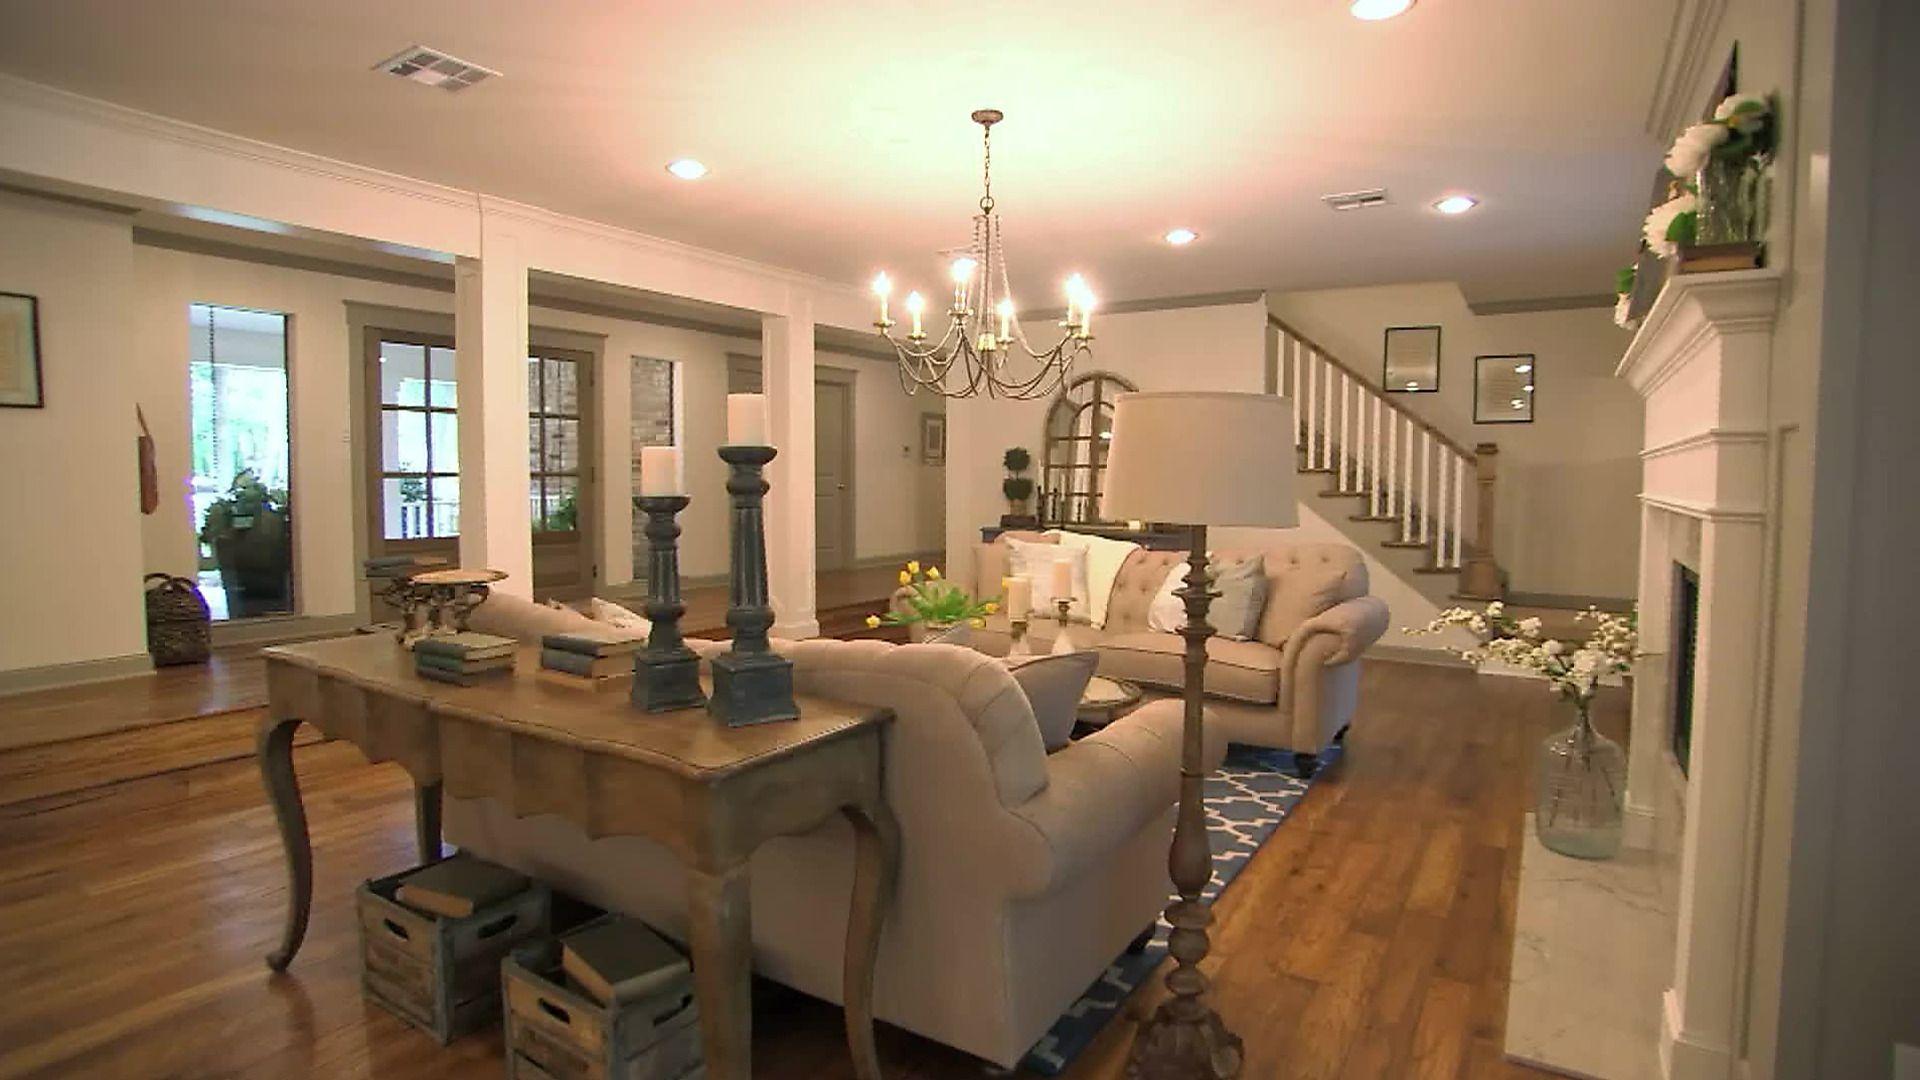 Hgtv Living Room Designs Web Exclusive Joanna's Design Tips  The Ferguson Project